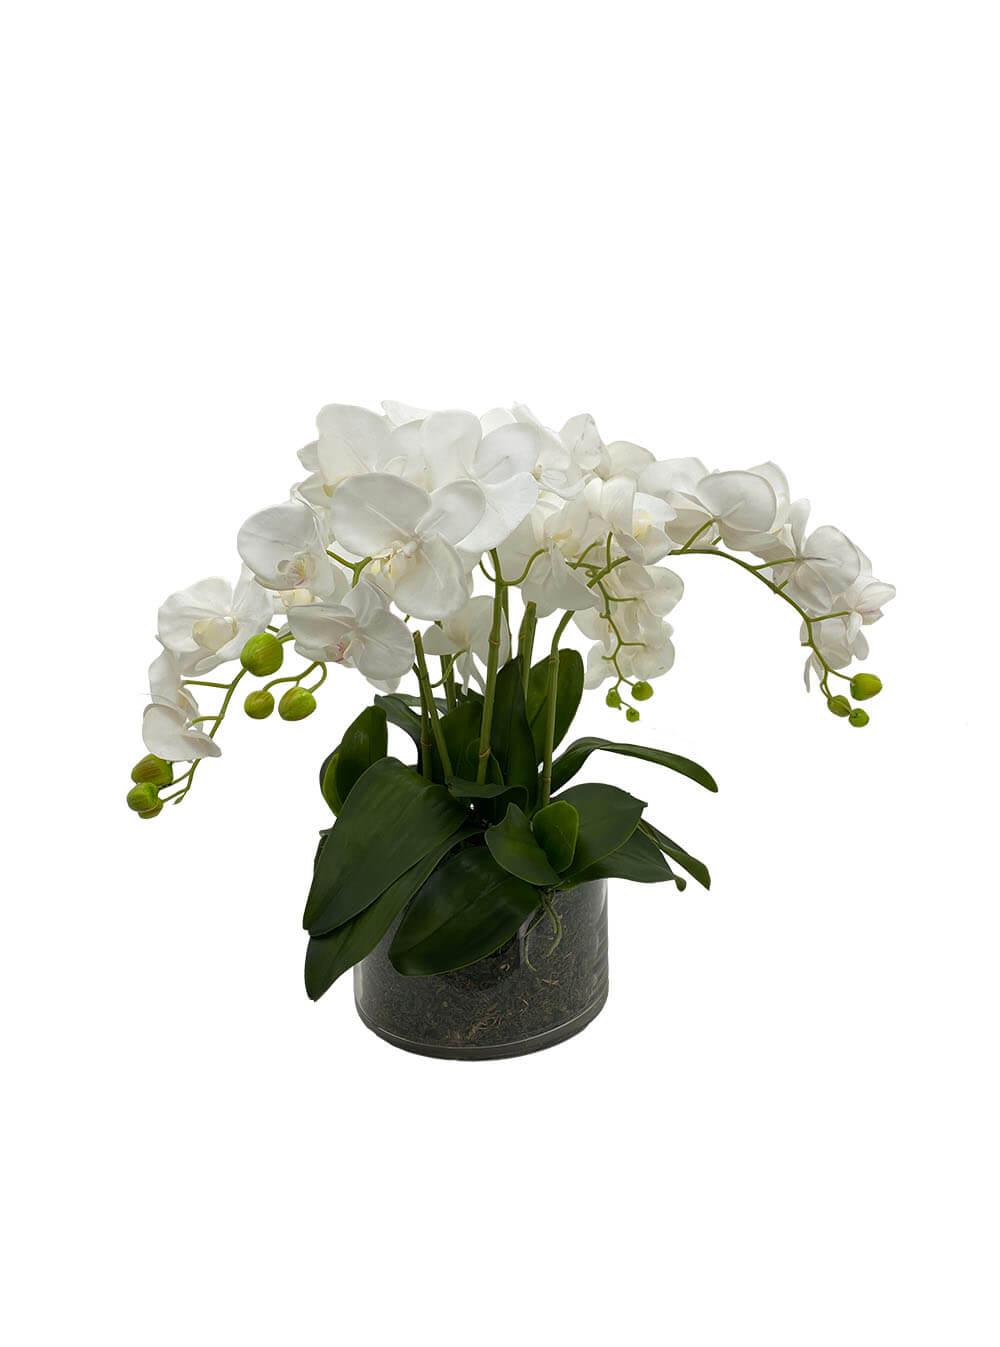 the grand phalenopsis arrangement